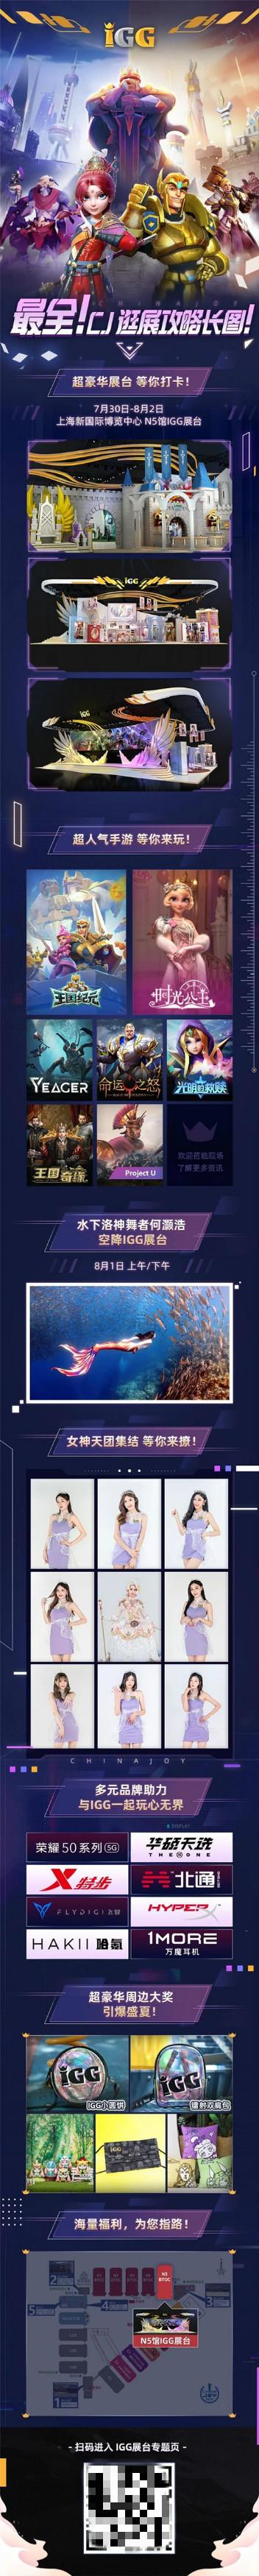 IGG 2021ChinaJoy玩乐盛典明日开幕,一图带你get全部亮点!